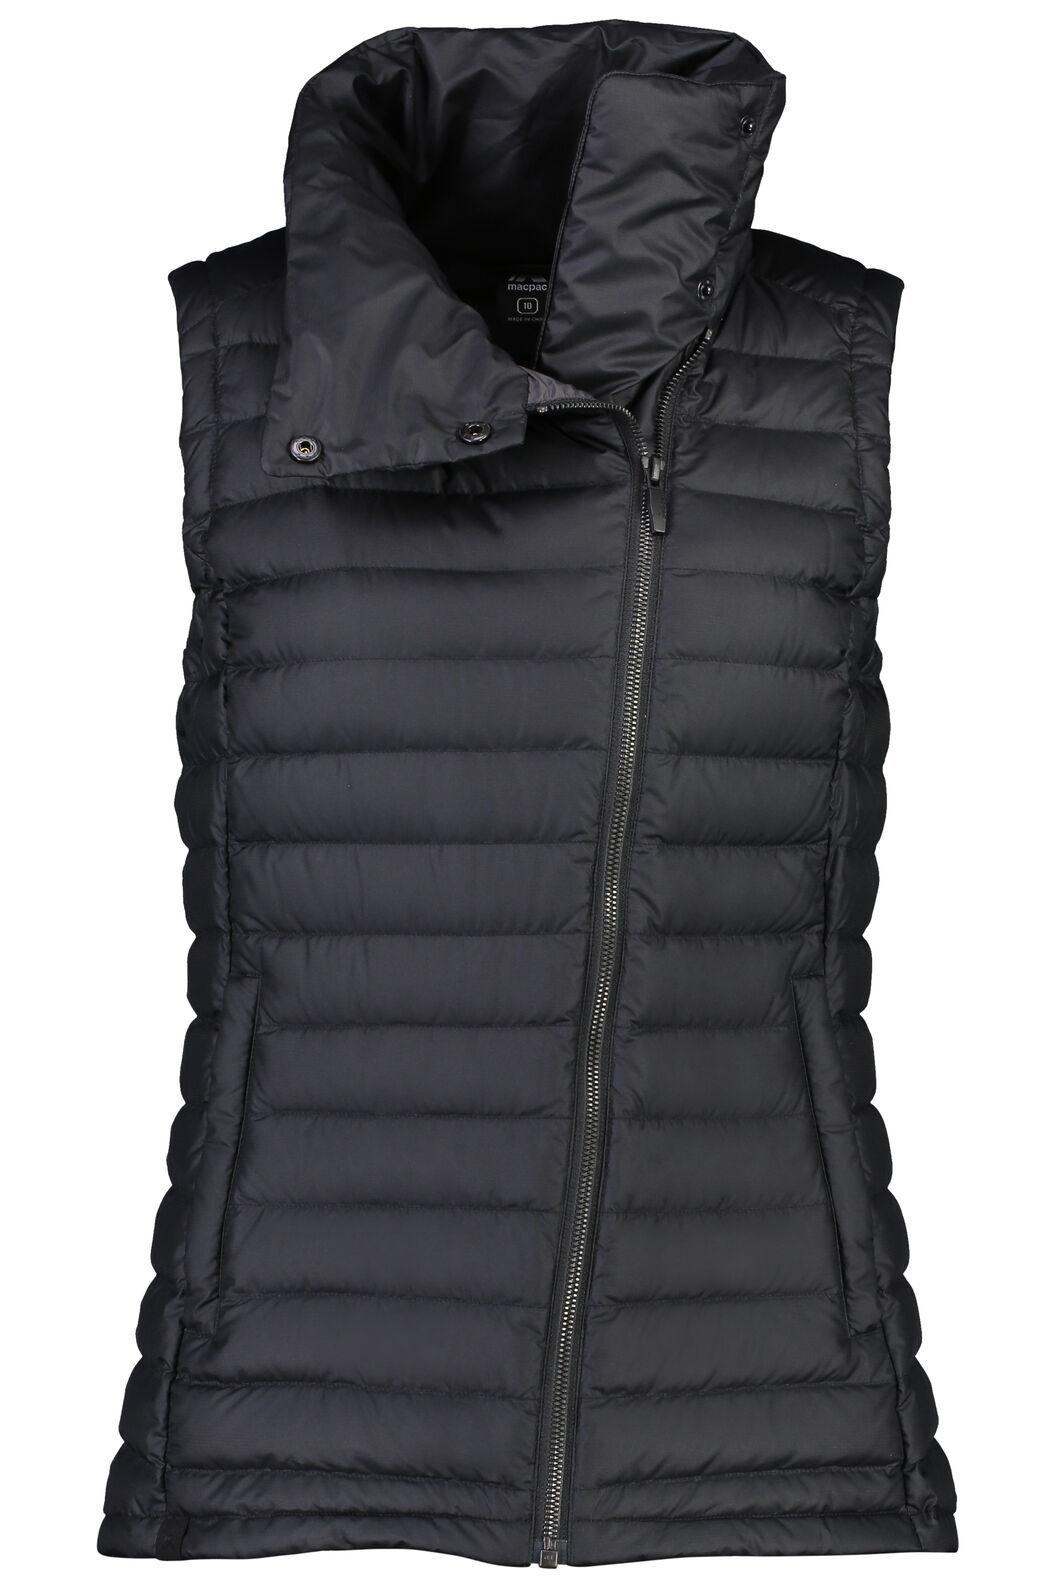 Macpac Demi Down Vest - Women's, Black, hi-res